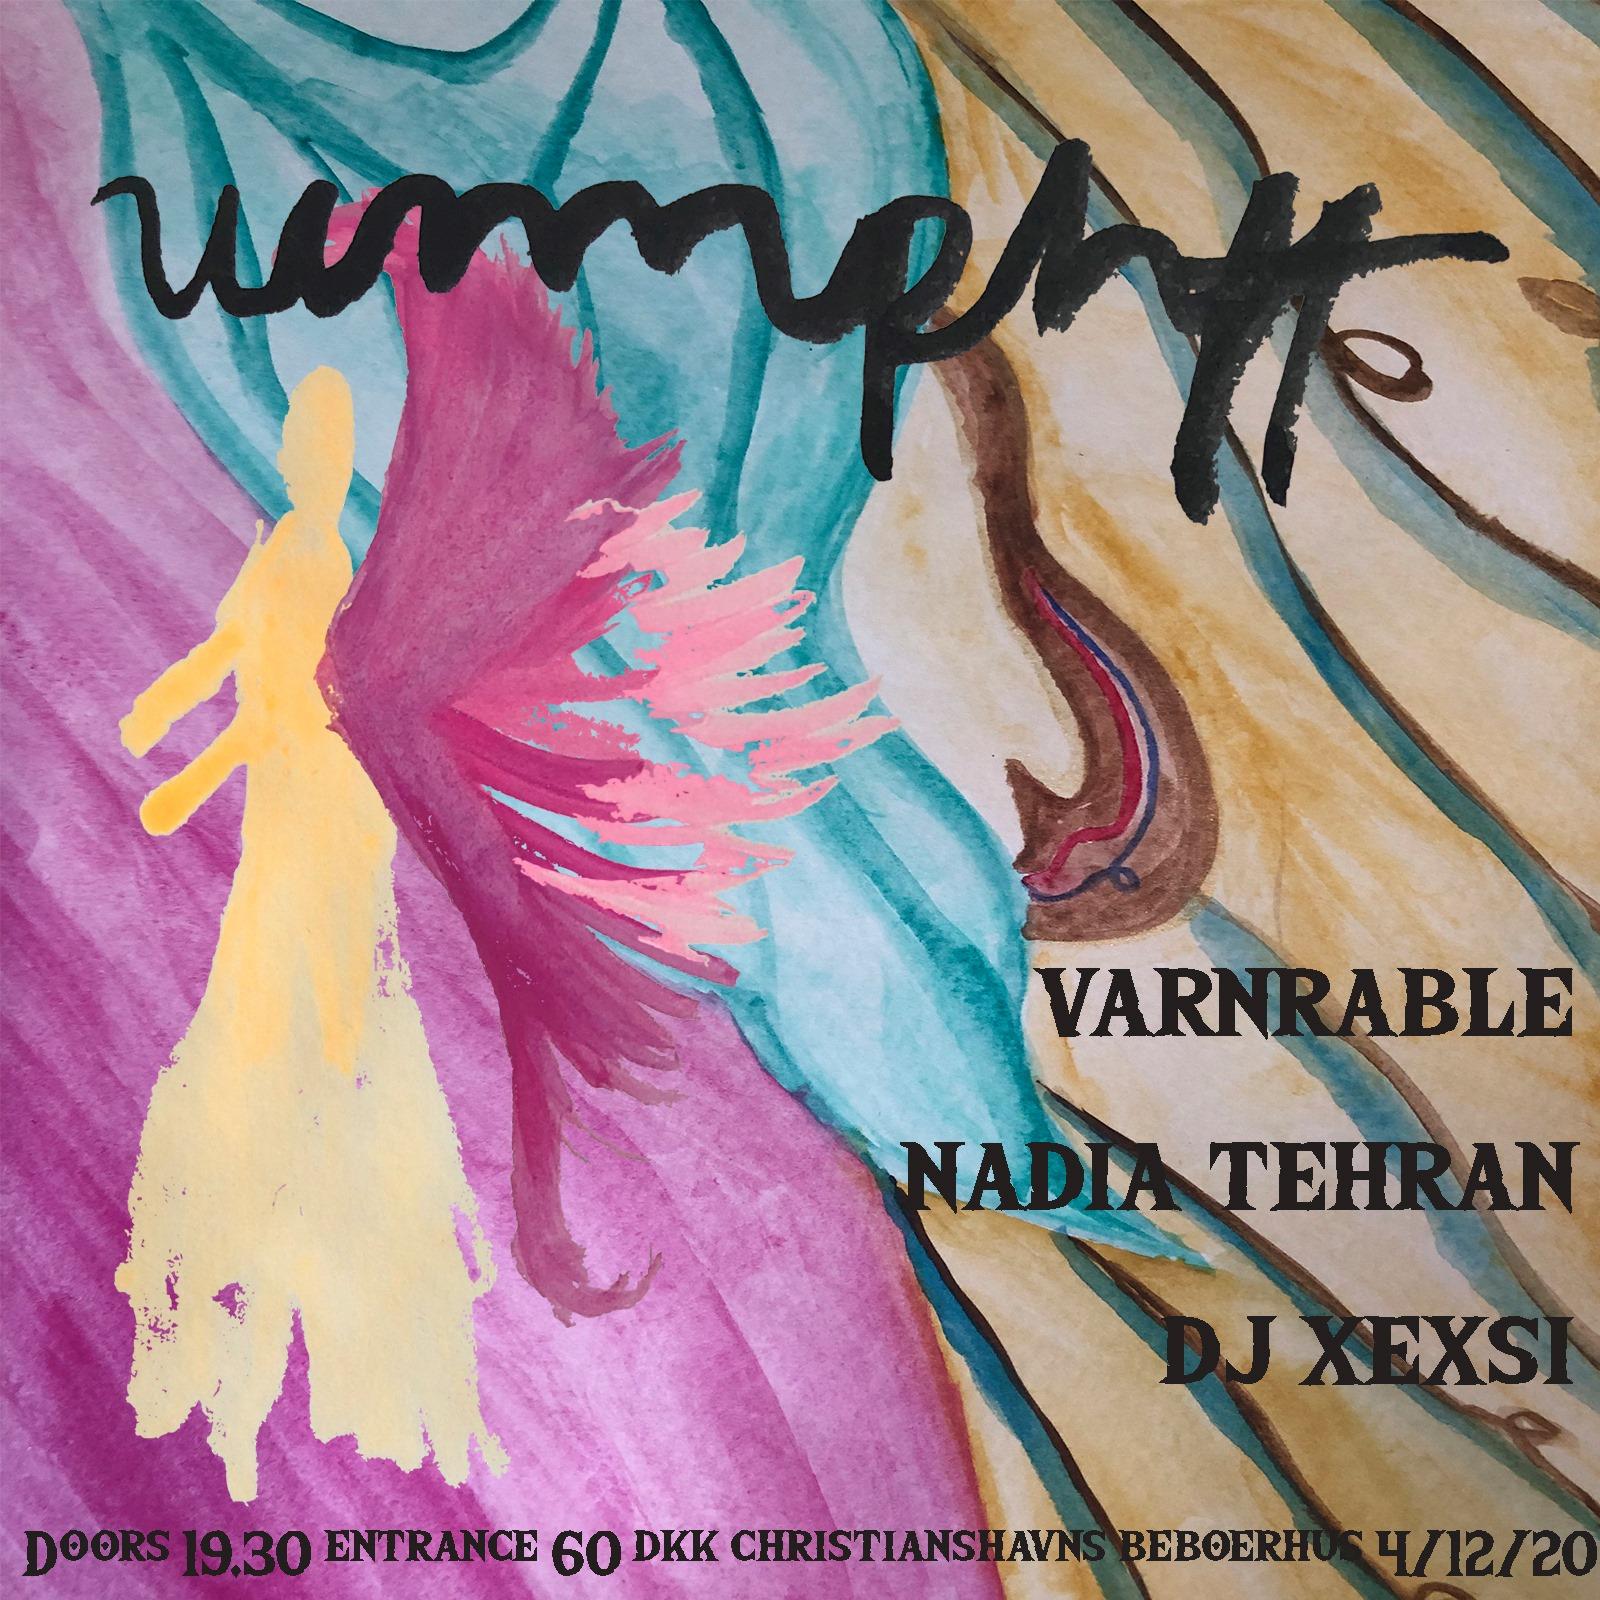 UUMPHFF – NADIA TEHRAN & VARNRABLE